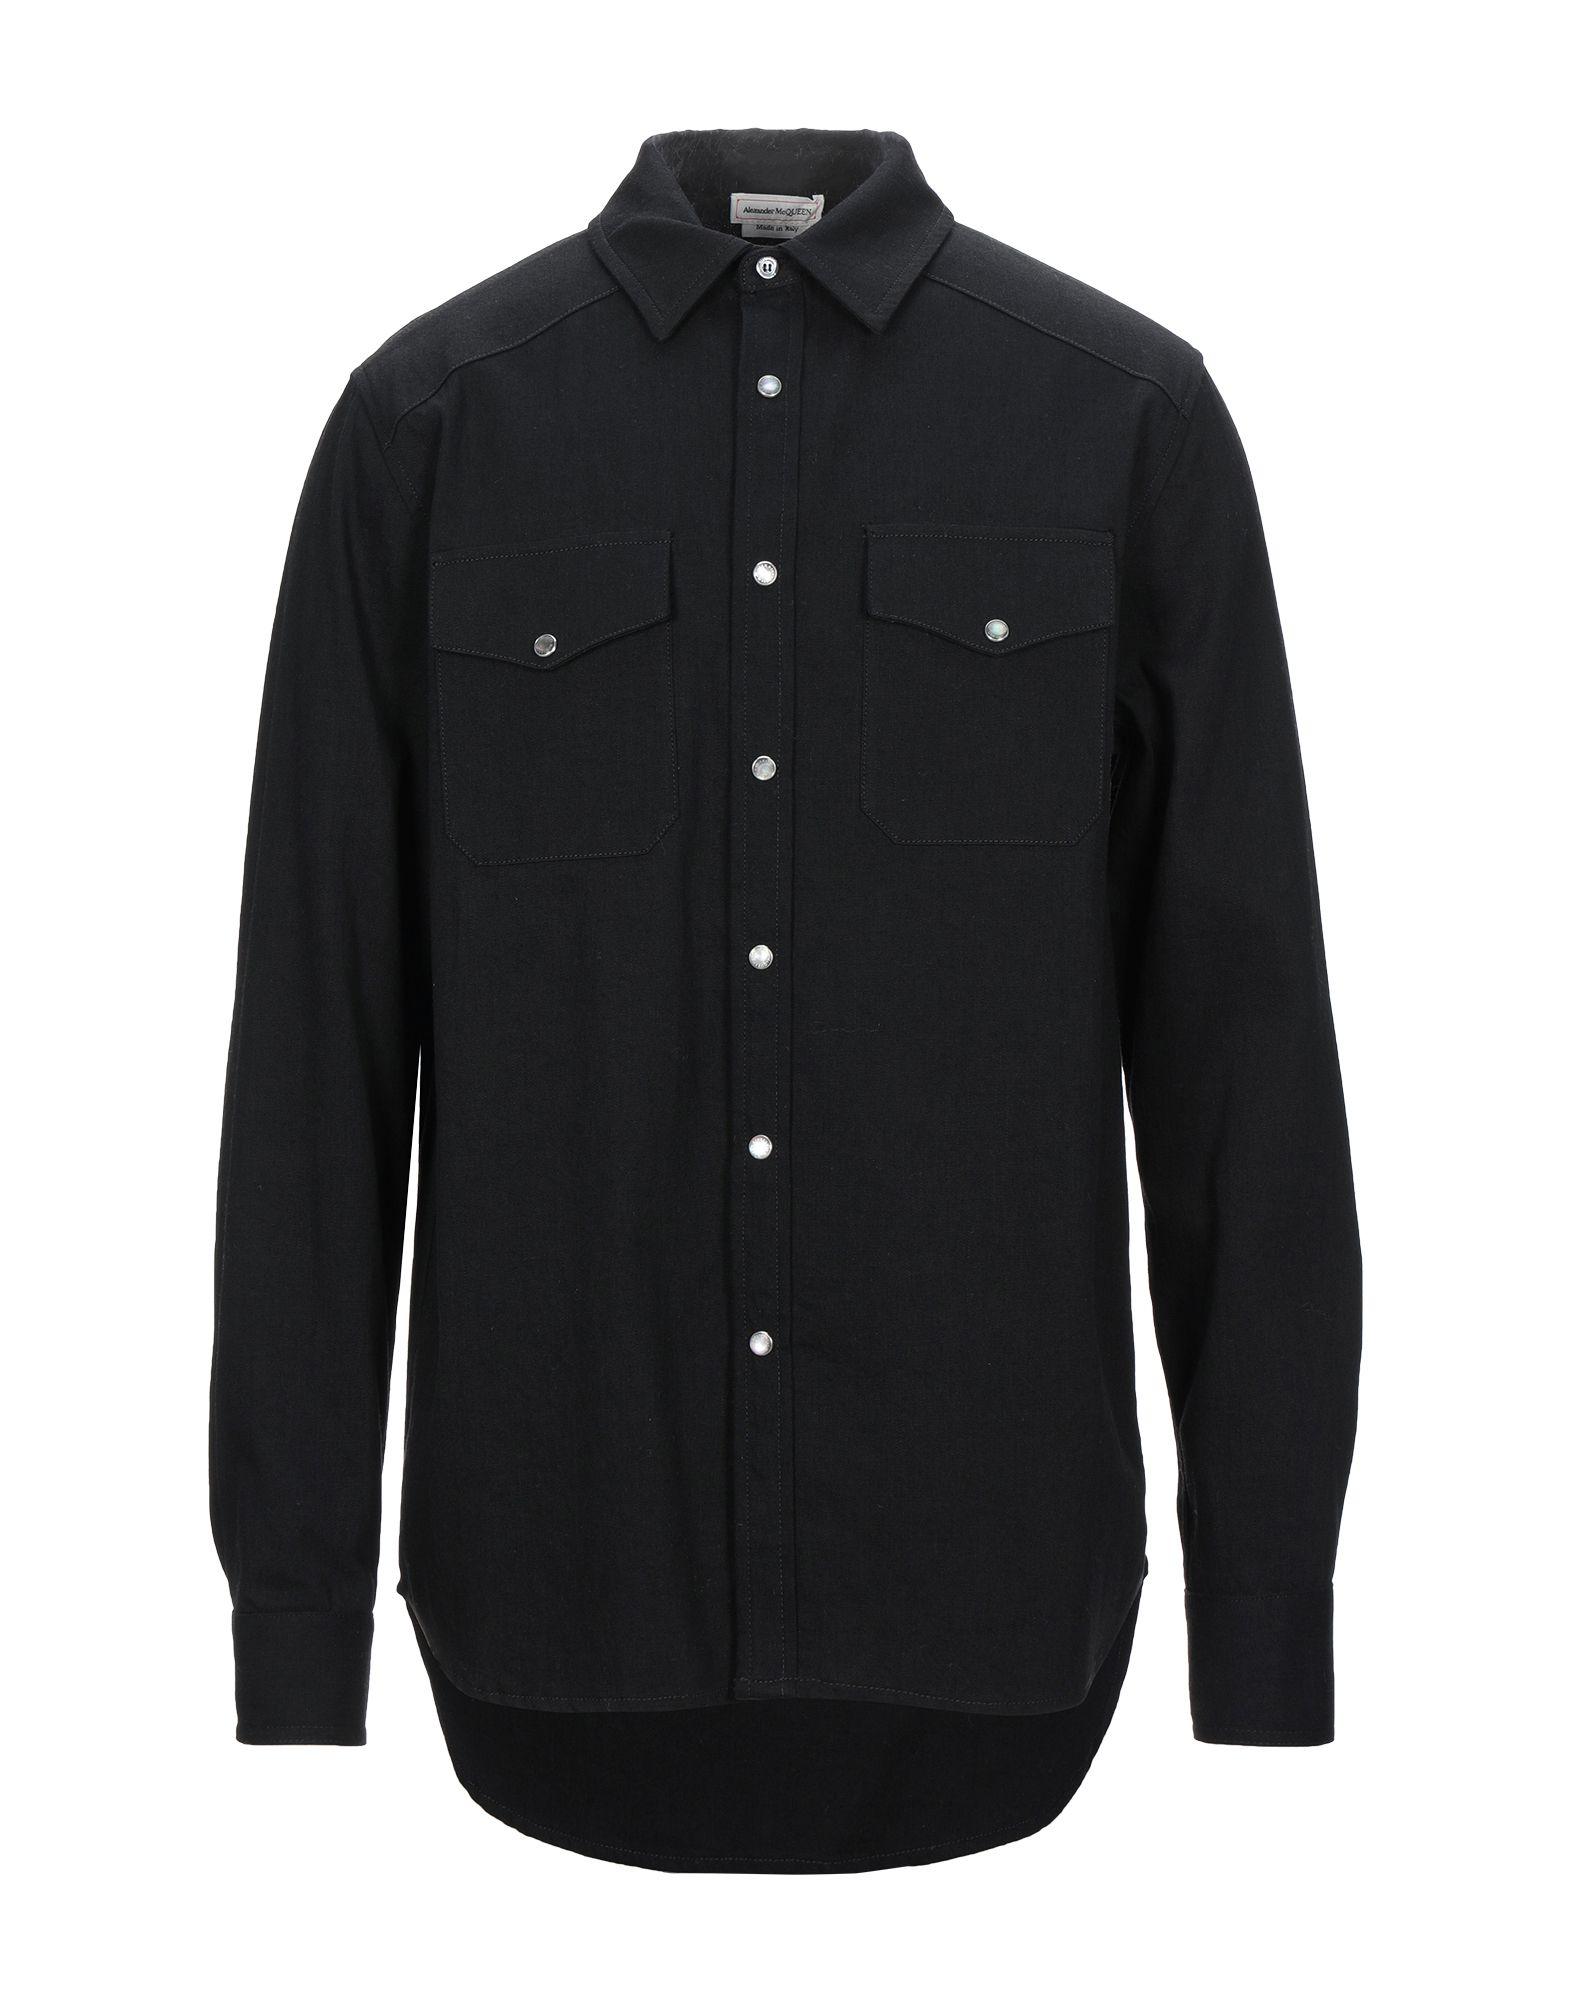 ALEXANDER MCQUEEN Denim shirts - Item 42814931